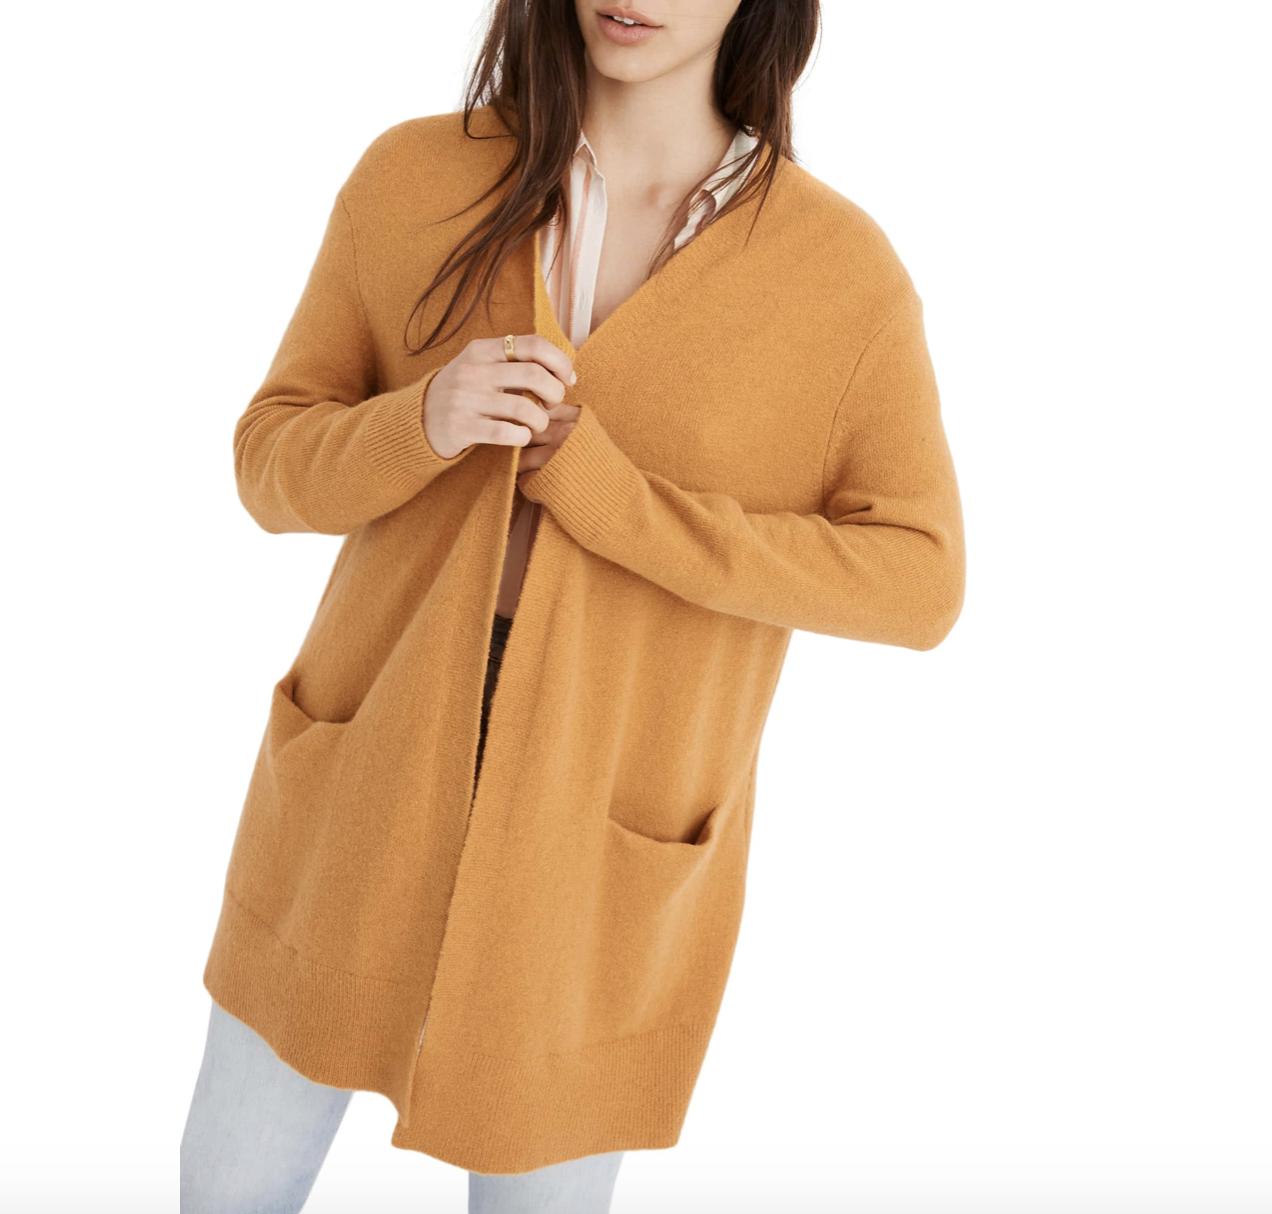 Mustard Cardigan | Nordstrom Anniversary Sale 2019 | A Demure Life Fashion Blog